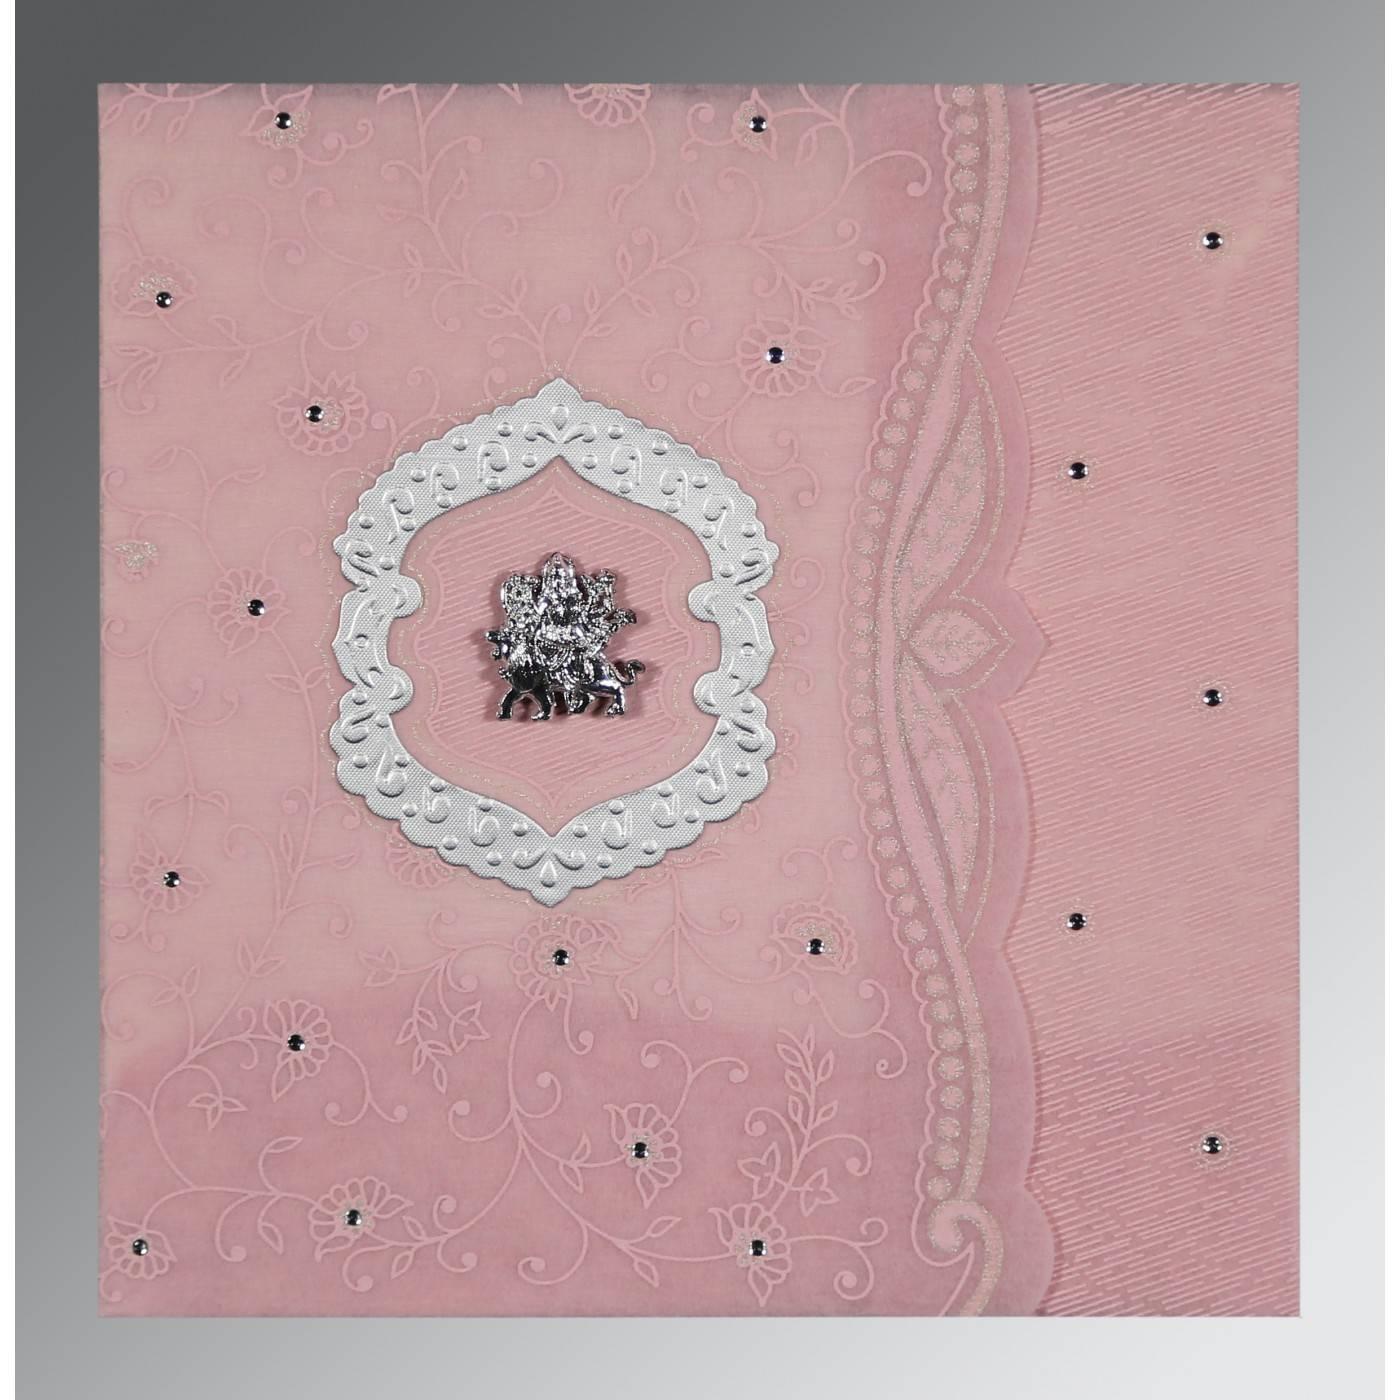 AZALEA PINK SHIMMERY FLORAL THEMED - EMBOSSED WEDDING CARD : CG-8209H - IndianWeddingCards